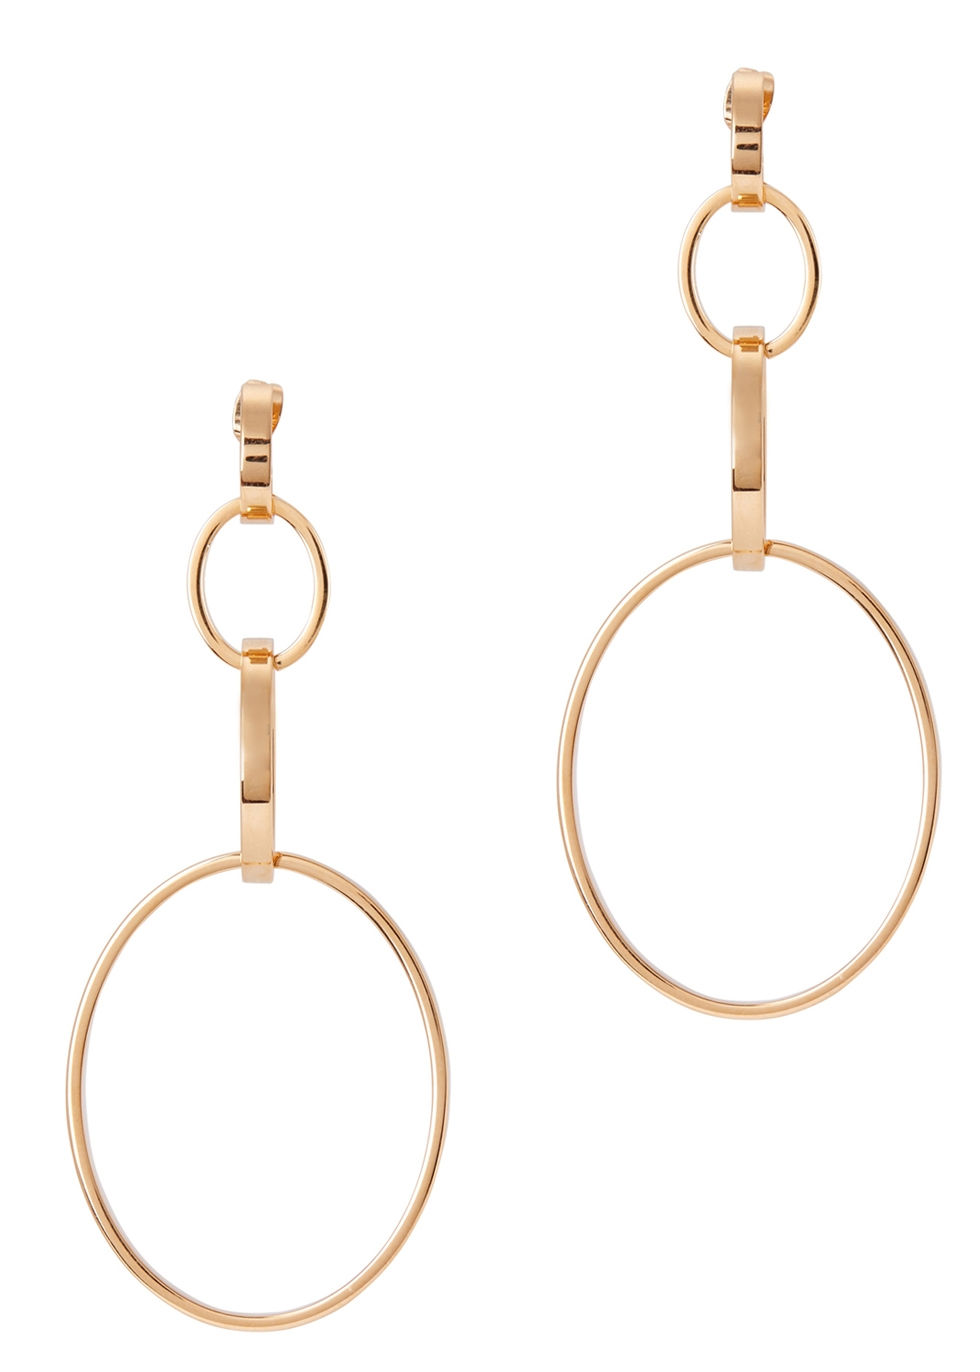 VITA FEDE CASSIO ROSE GOLD-PLATED EARRINGS